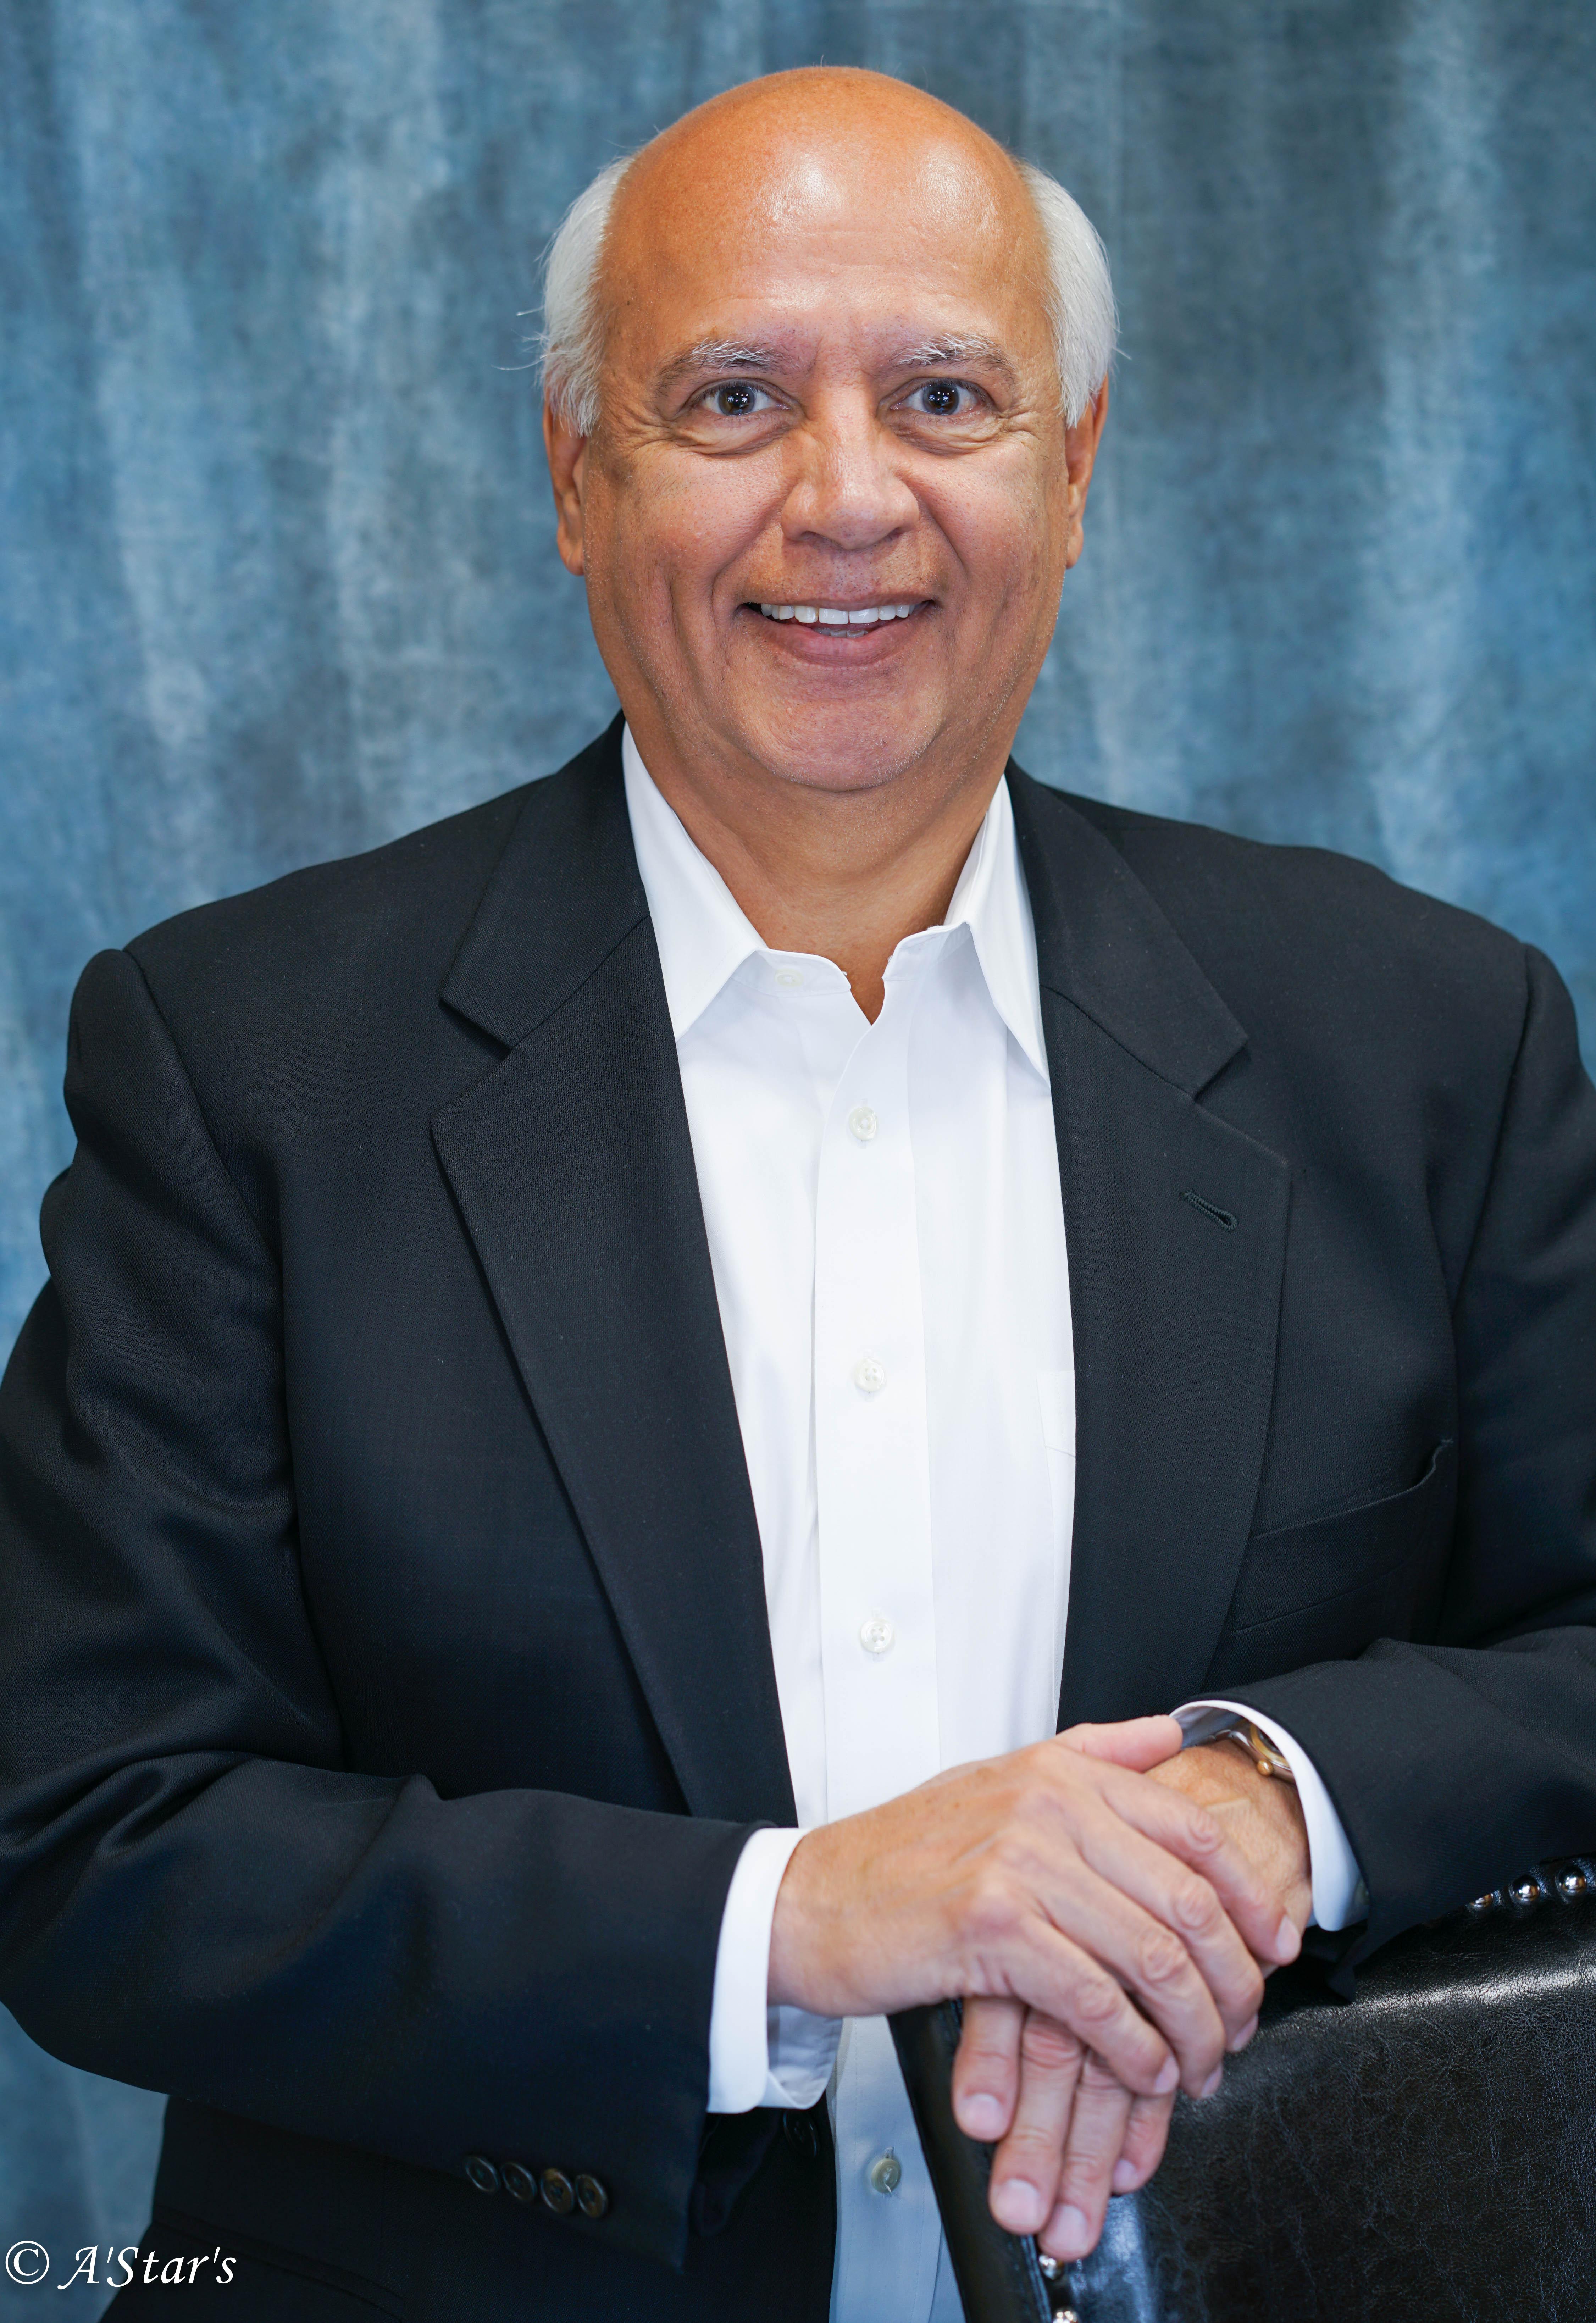 Stan Sena - President & CEO